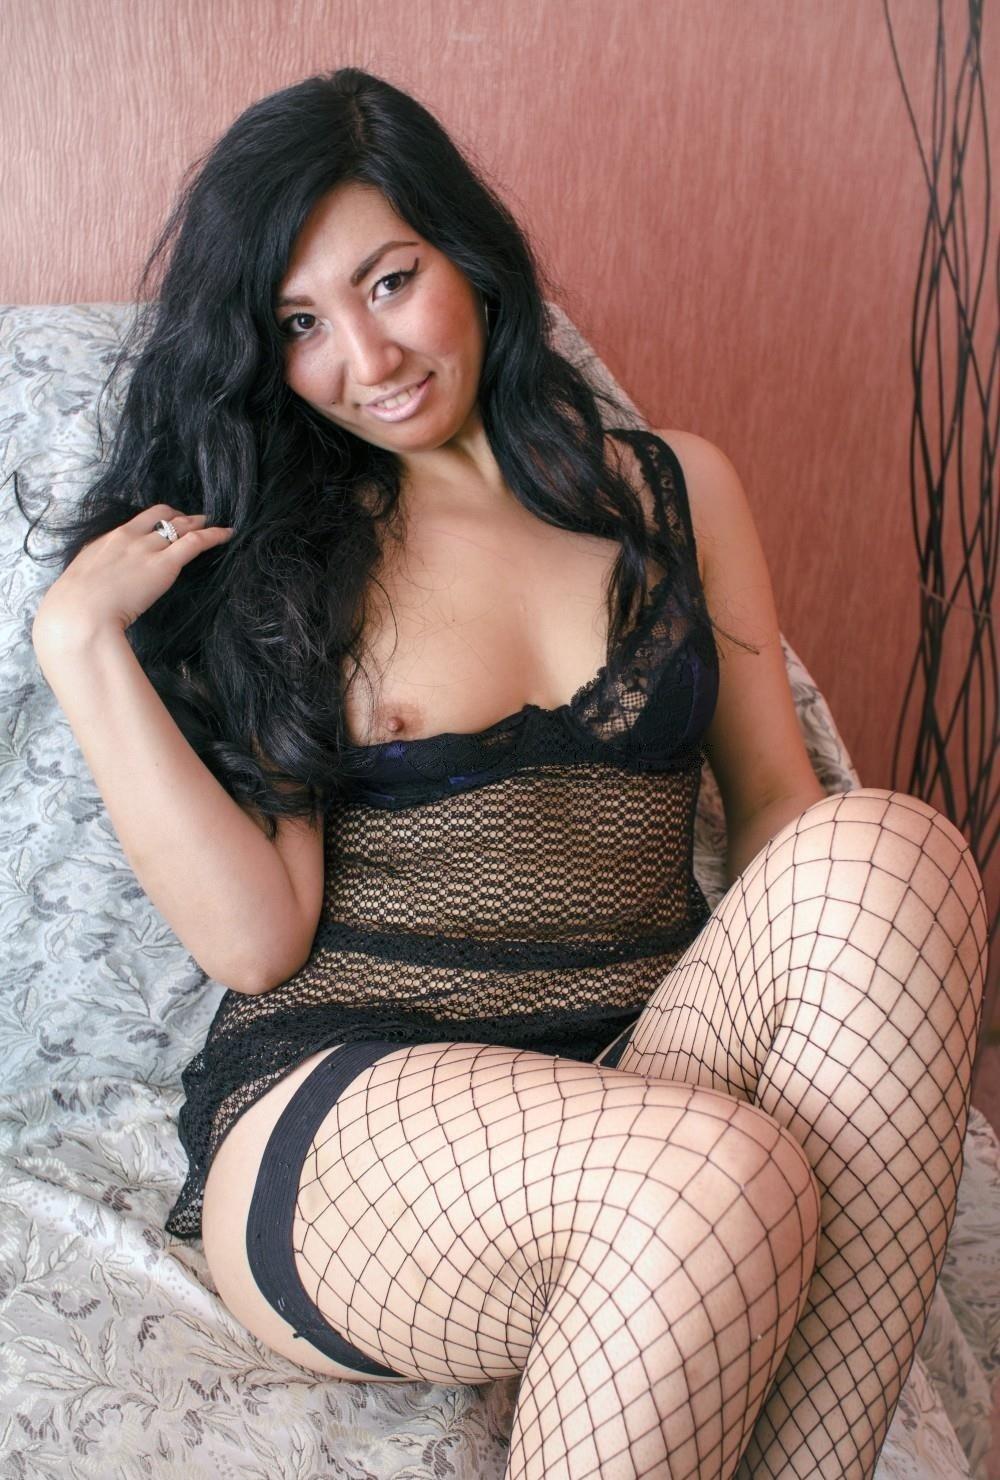 узбечка питерский проститутка